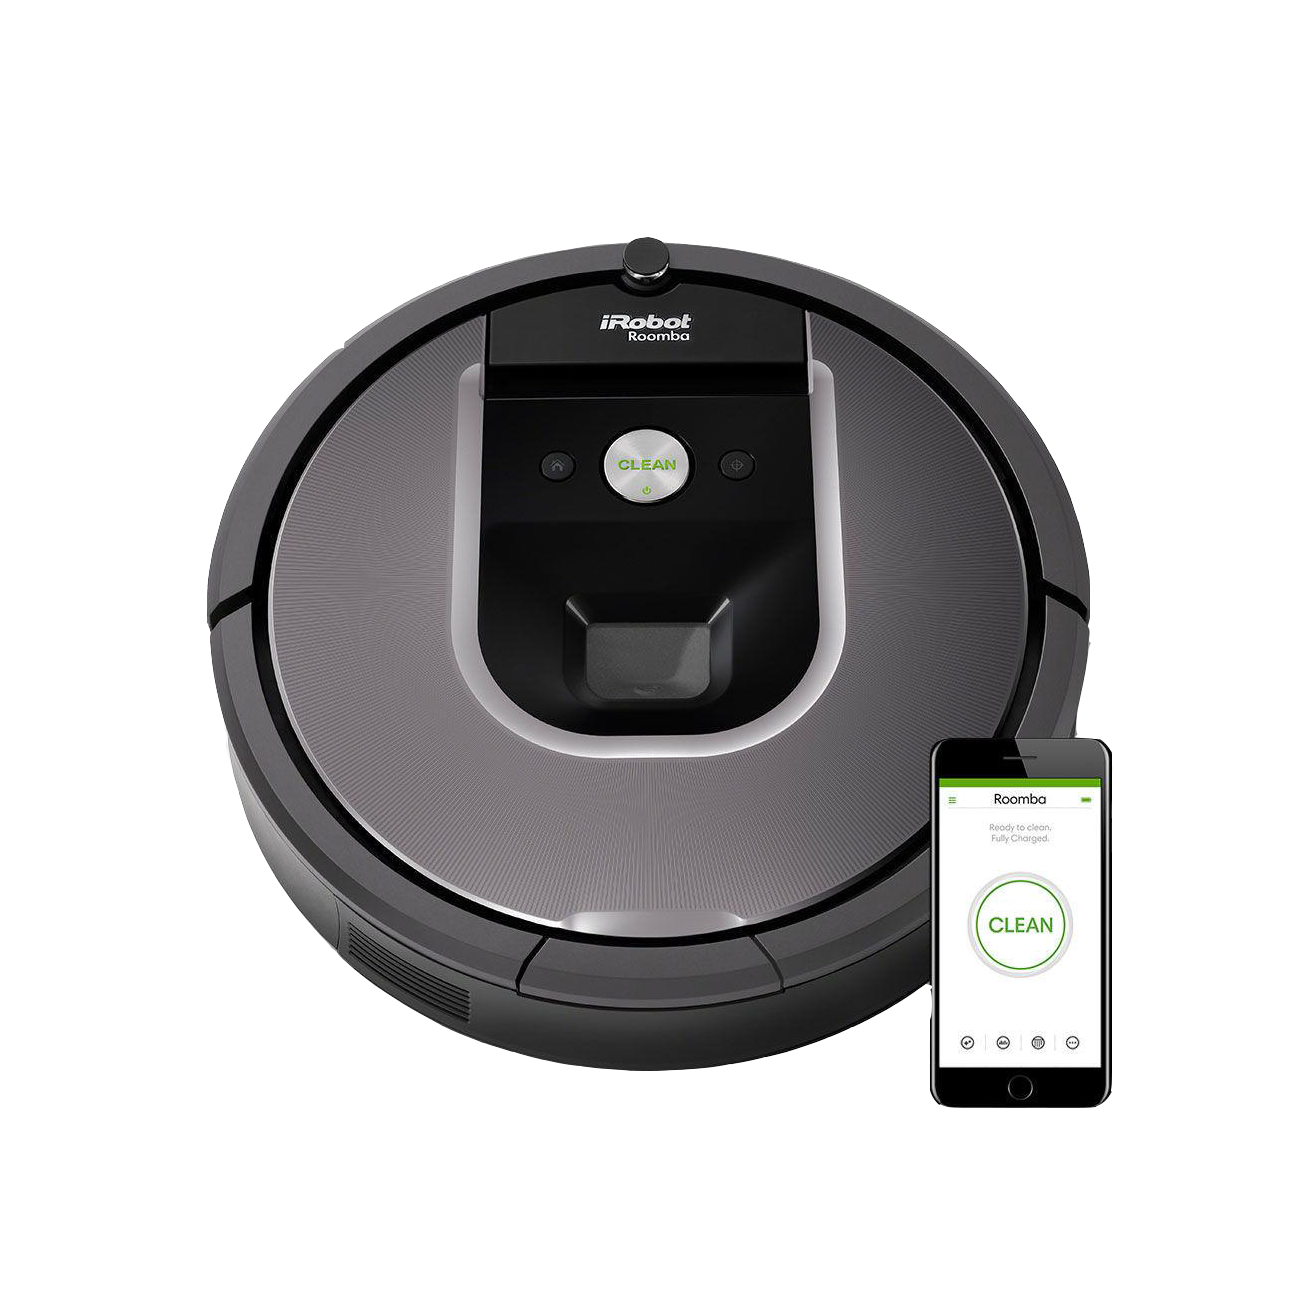 iRobot Roomba® 960 Irobot, Roomba vacuum, Robot vacuum